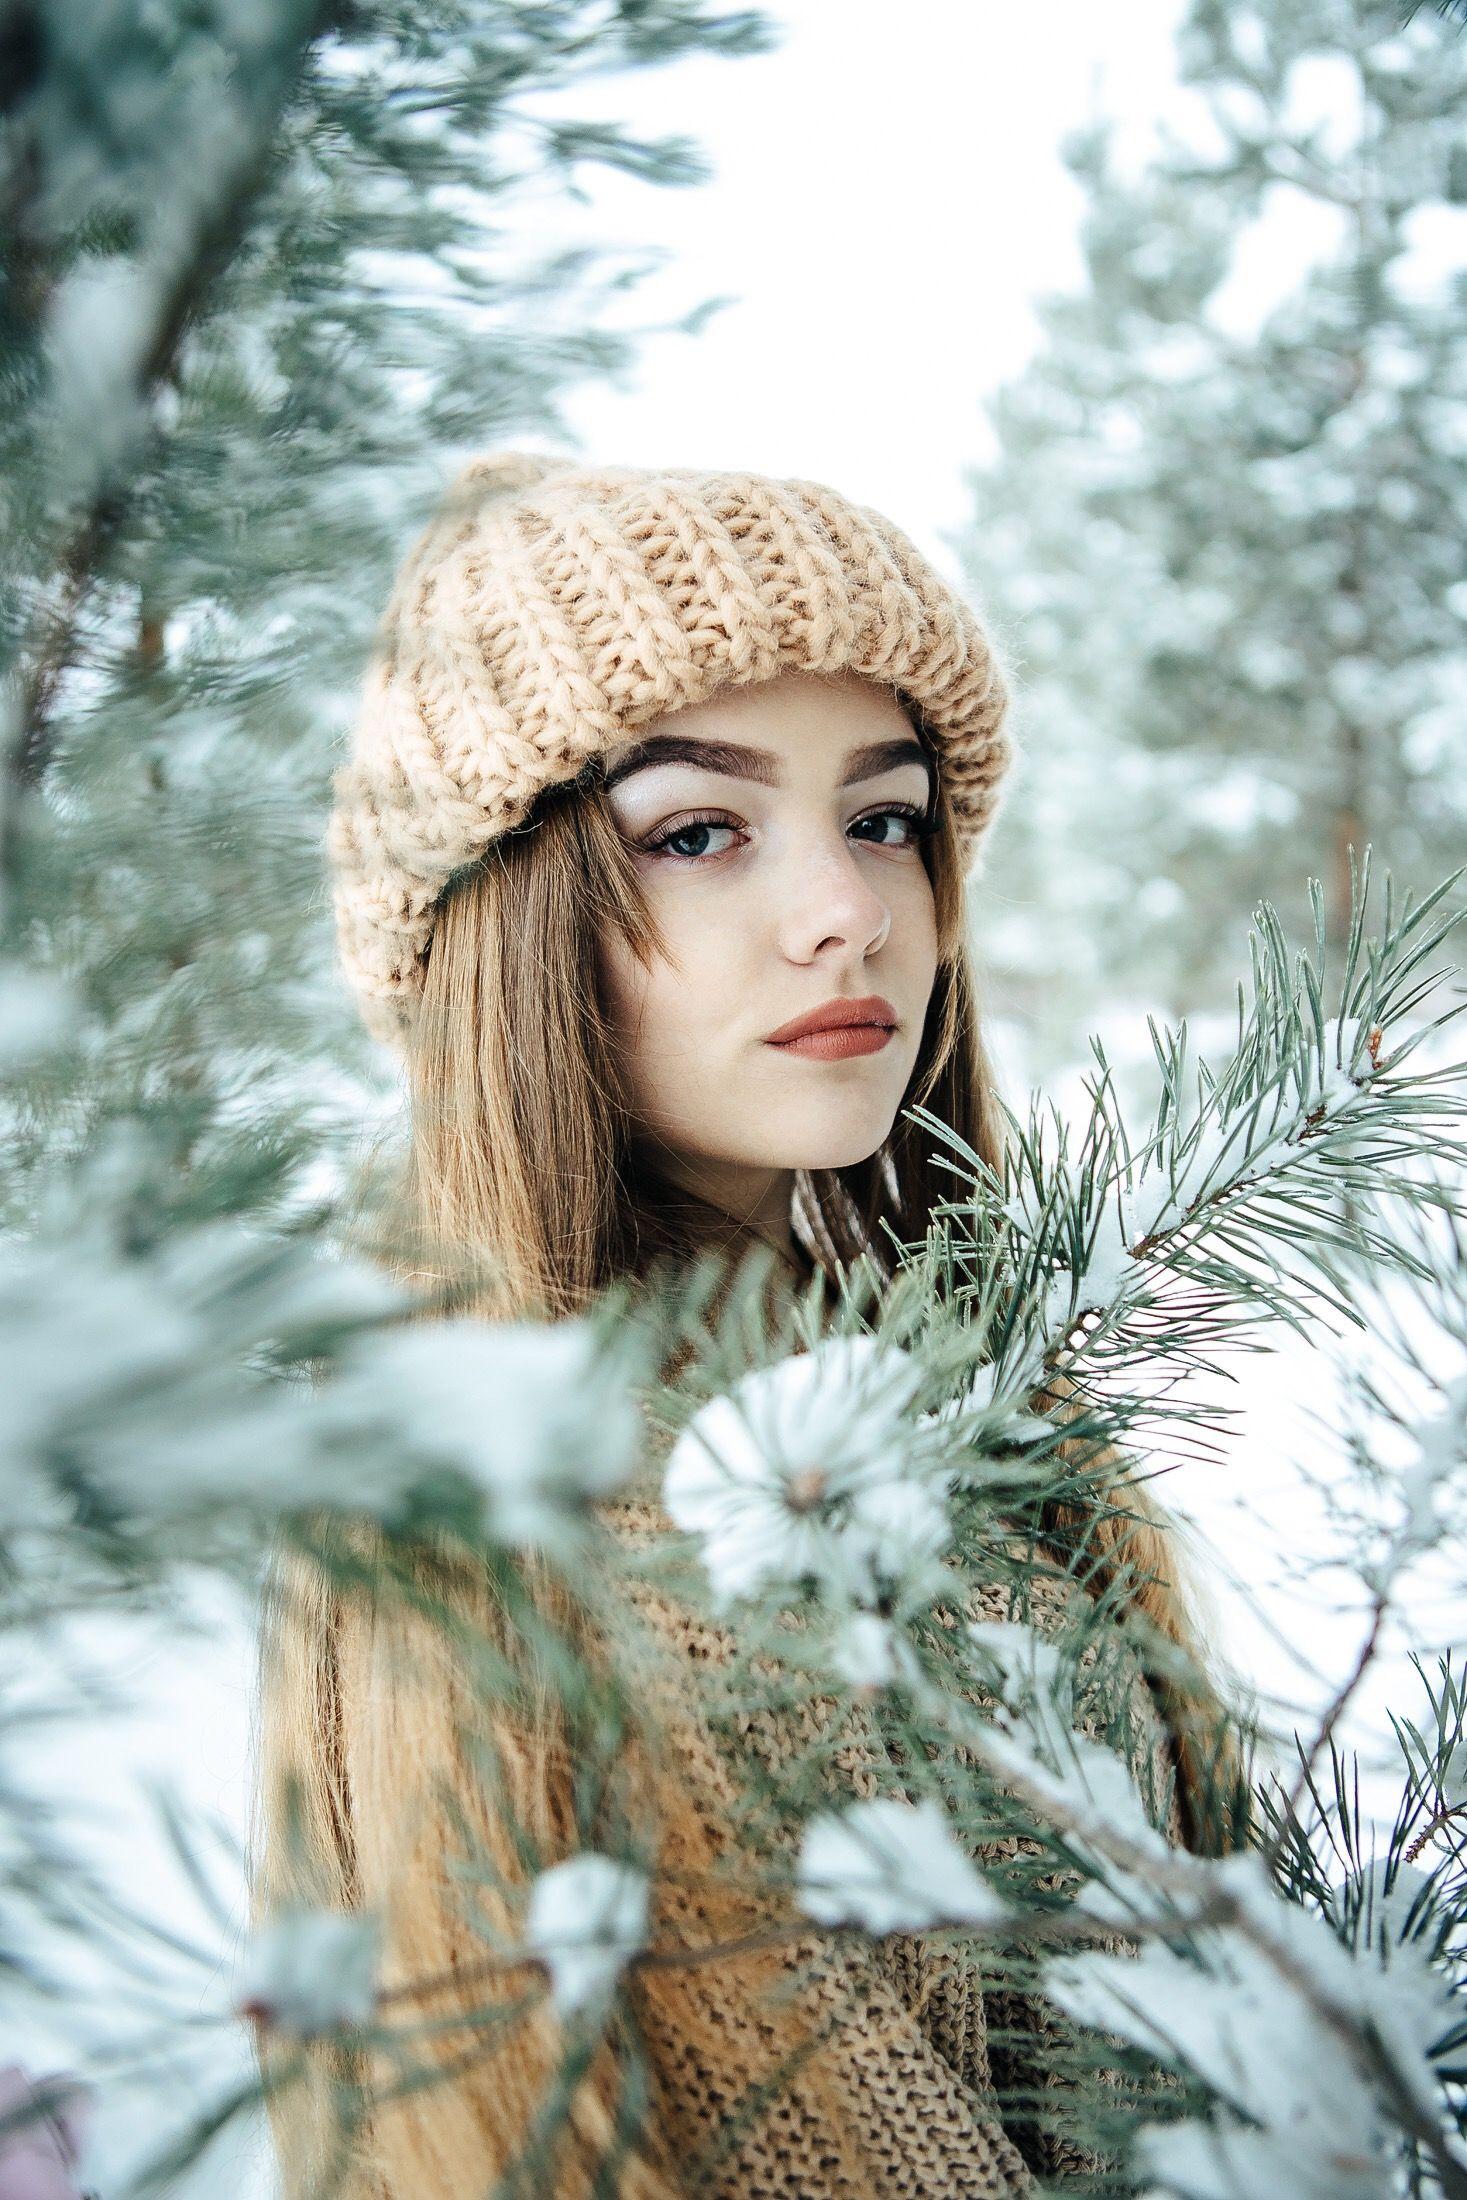 надежда снежная фото городом